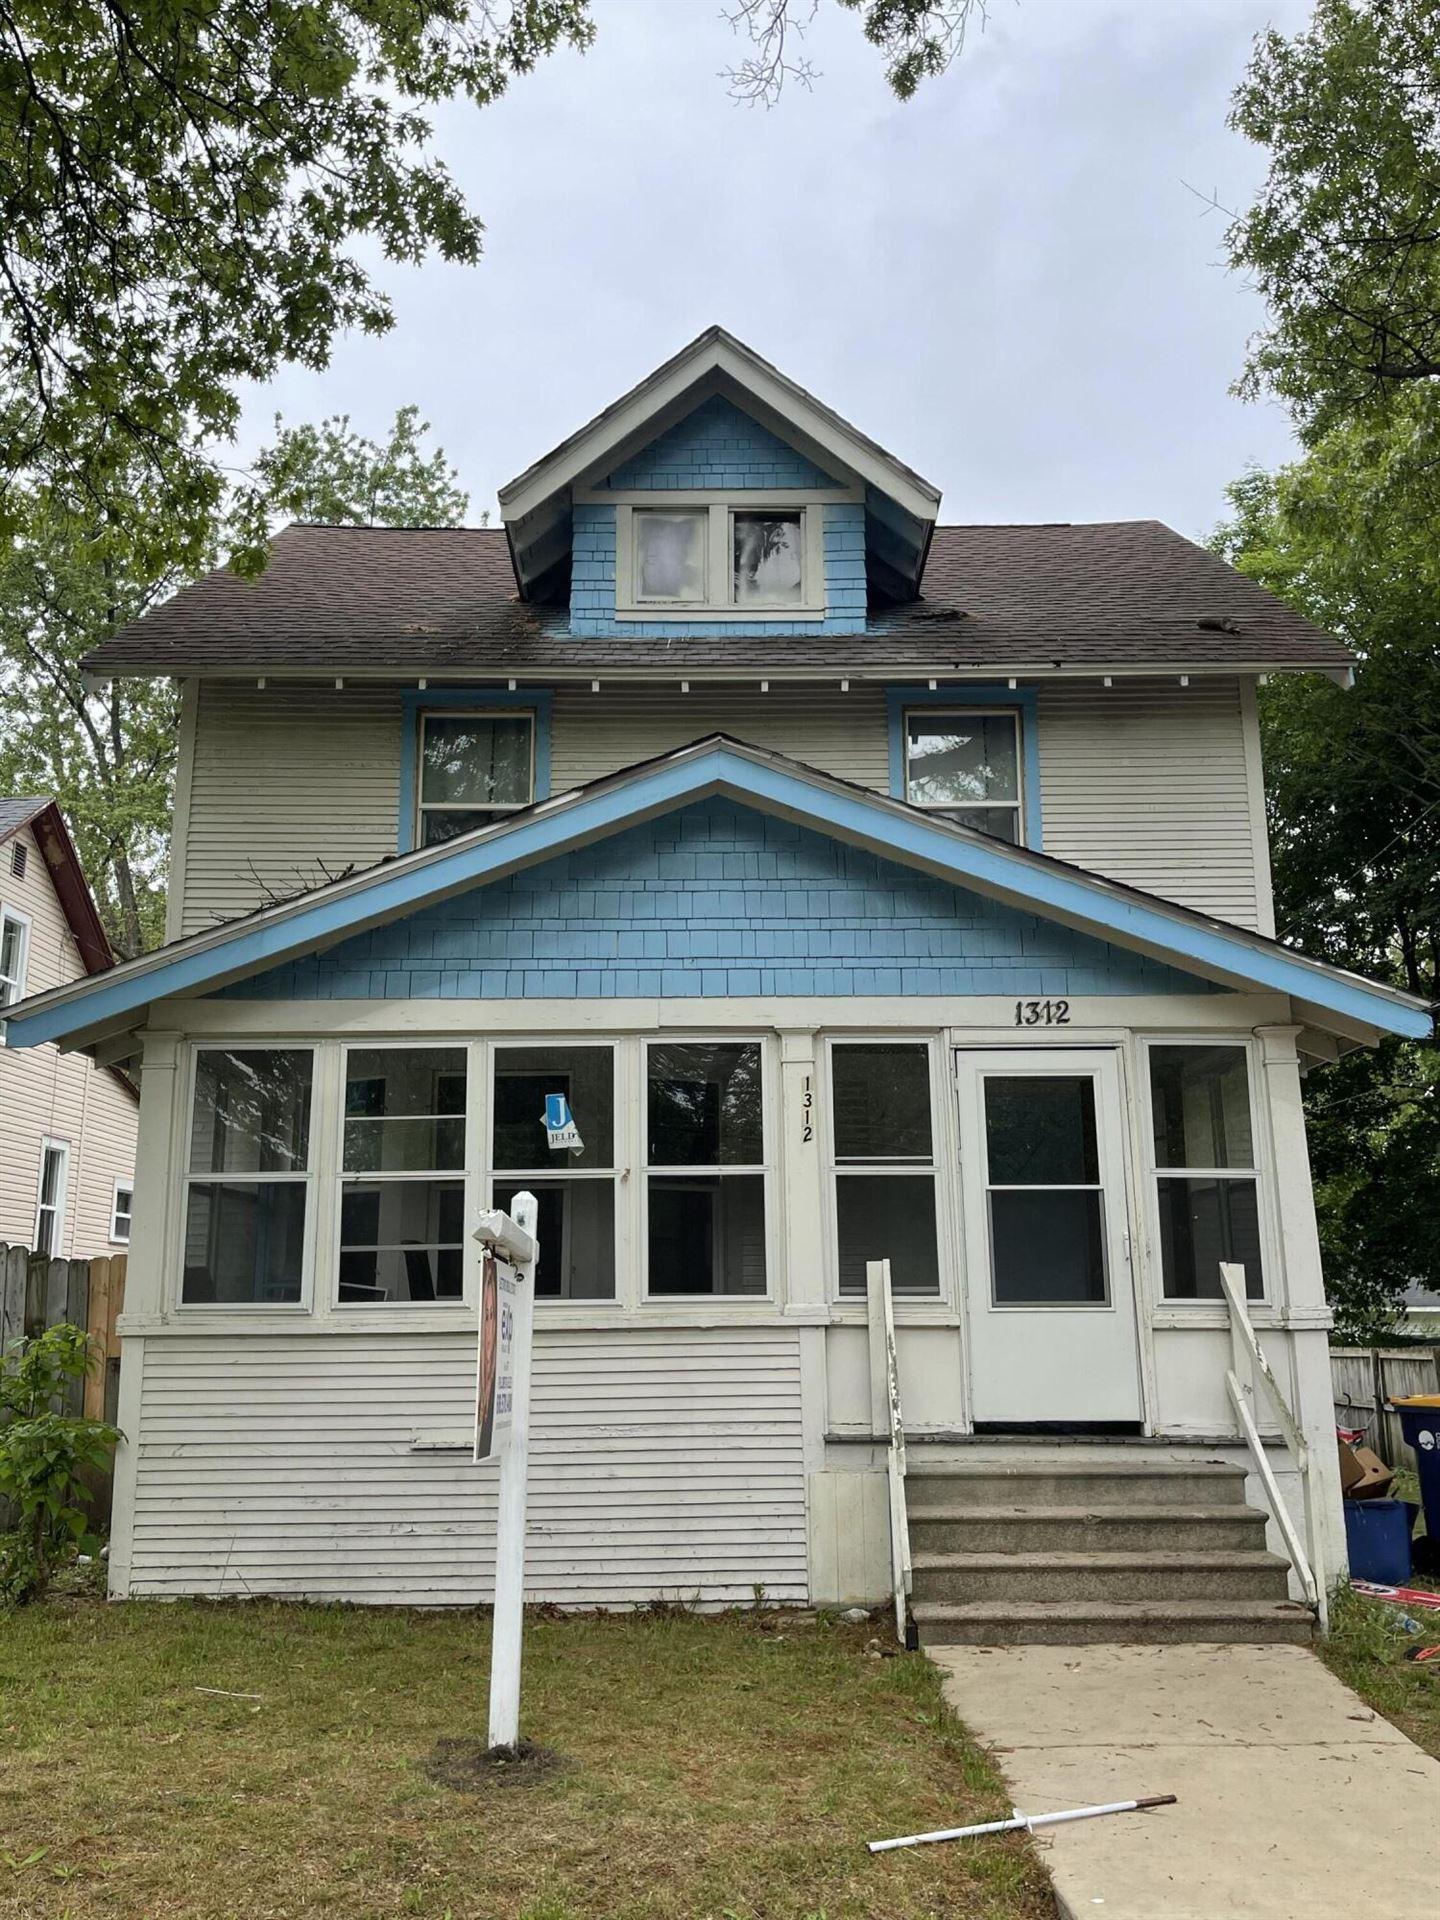 1312 Eastern Avenue SE, Grand Rapids, MI 49507 - MLS#: 21019569